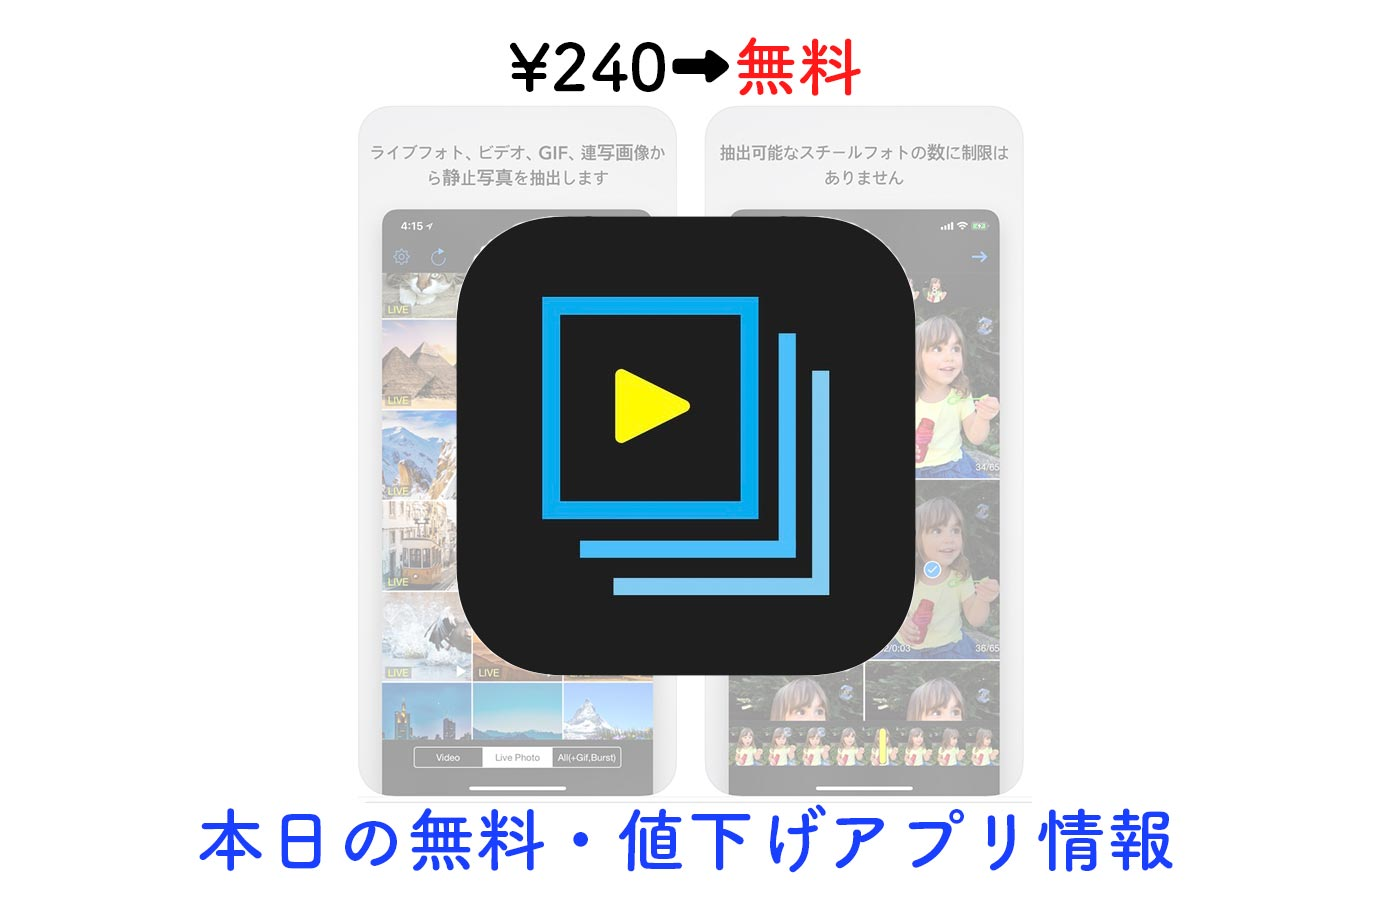 Appsale0426